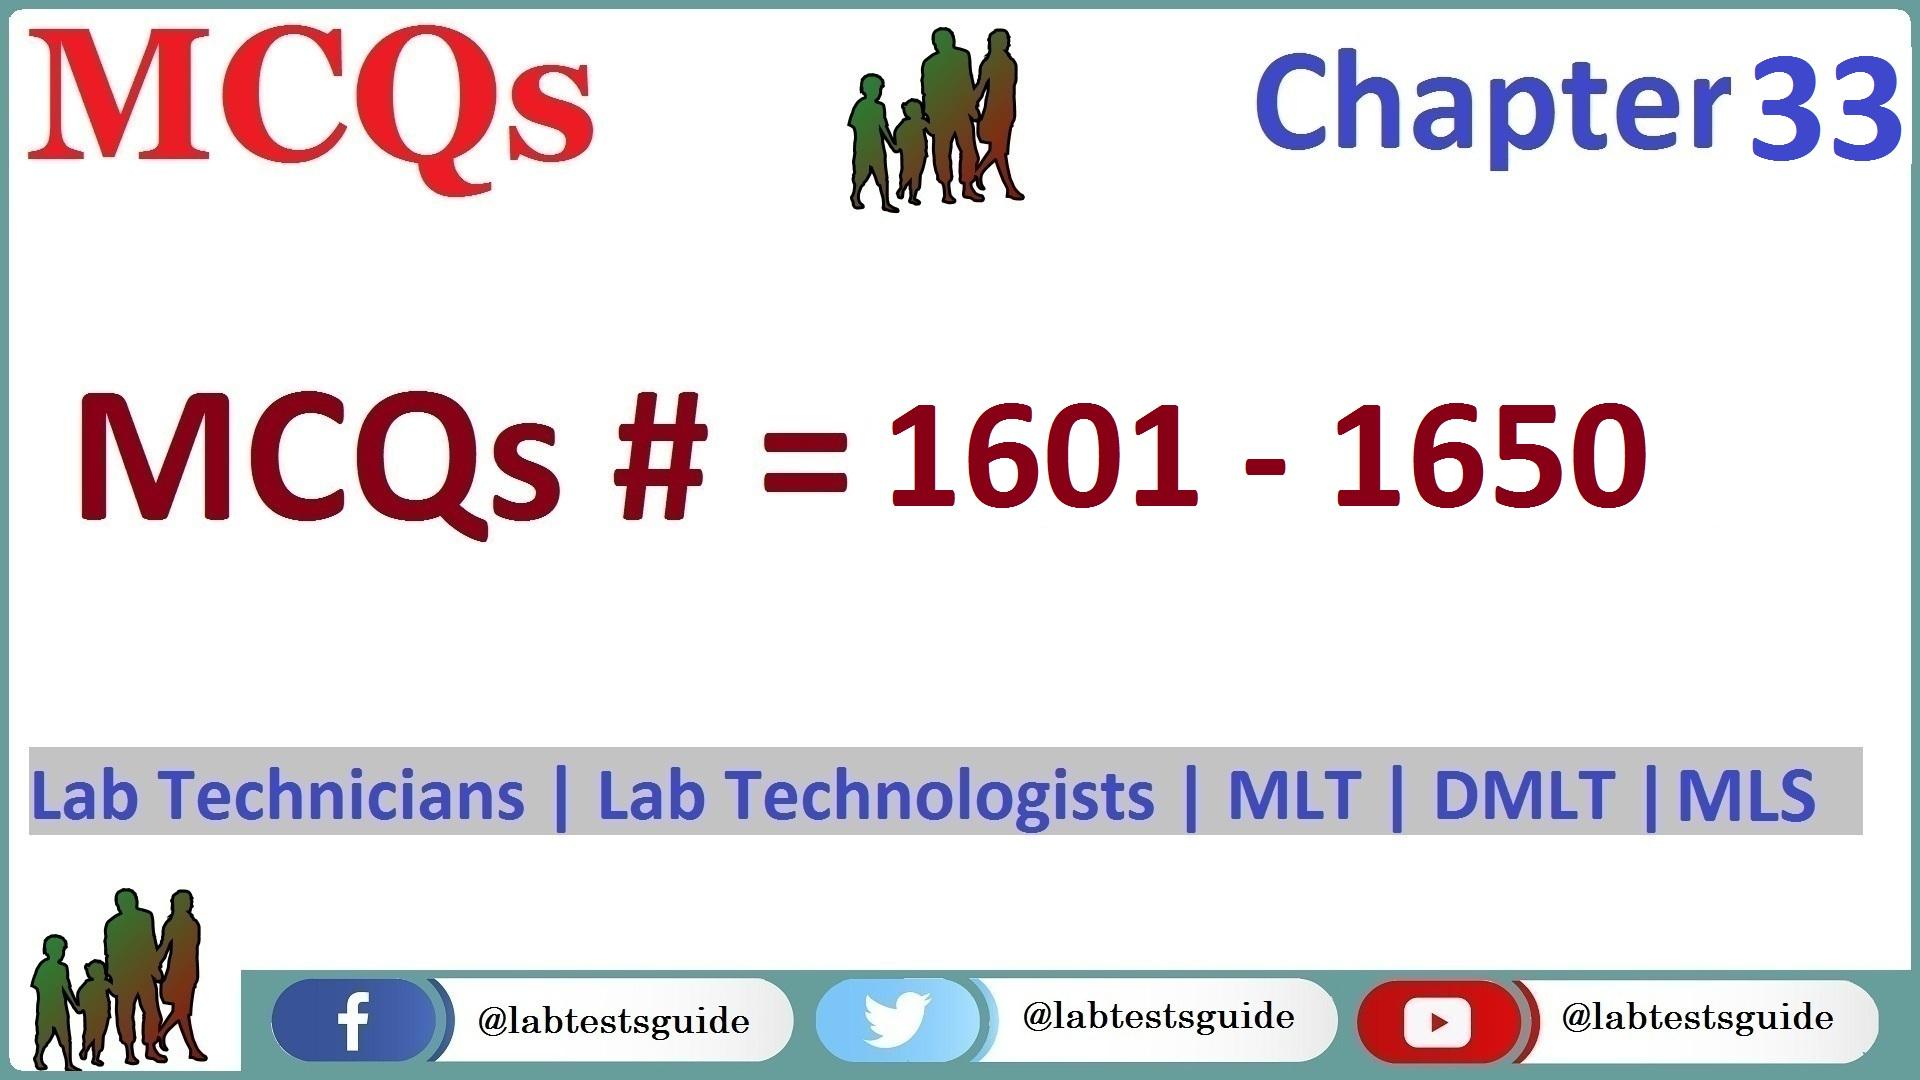 MCQs Chapter 33